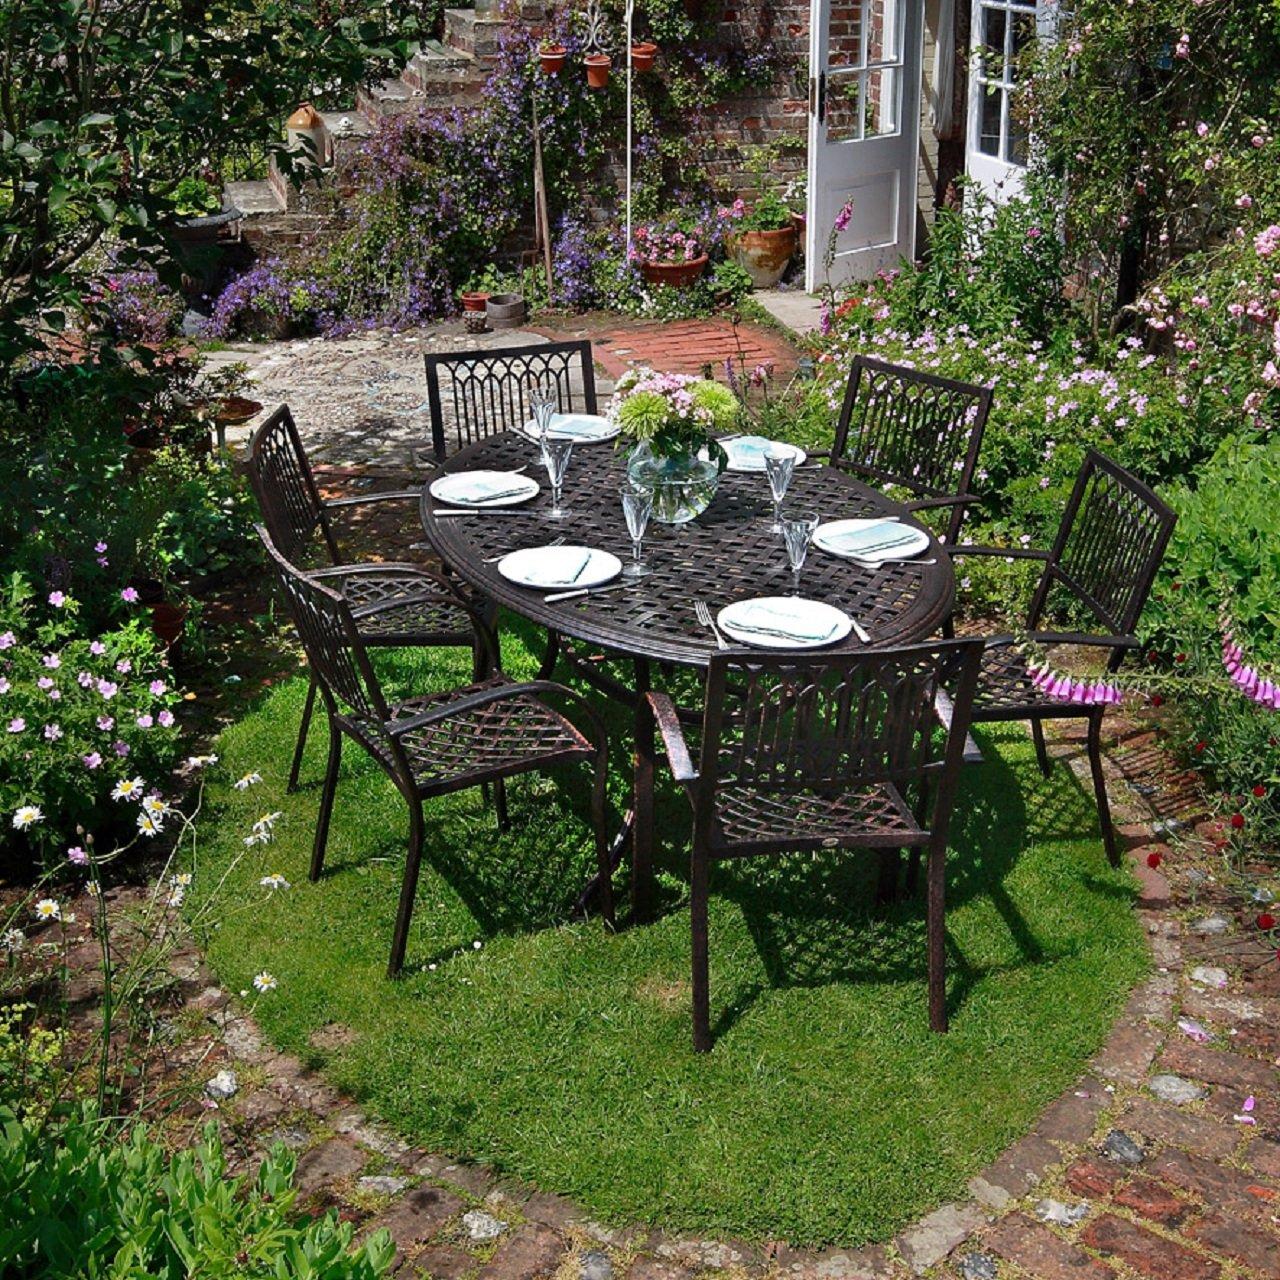 Nicole 180cm Ovales Gartenmöbelset Aluminium - 1 NICOLE Tisch + 6 MARY Stühle